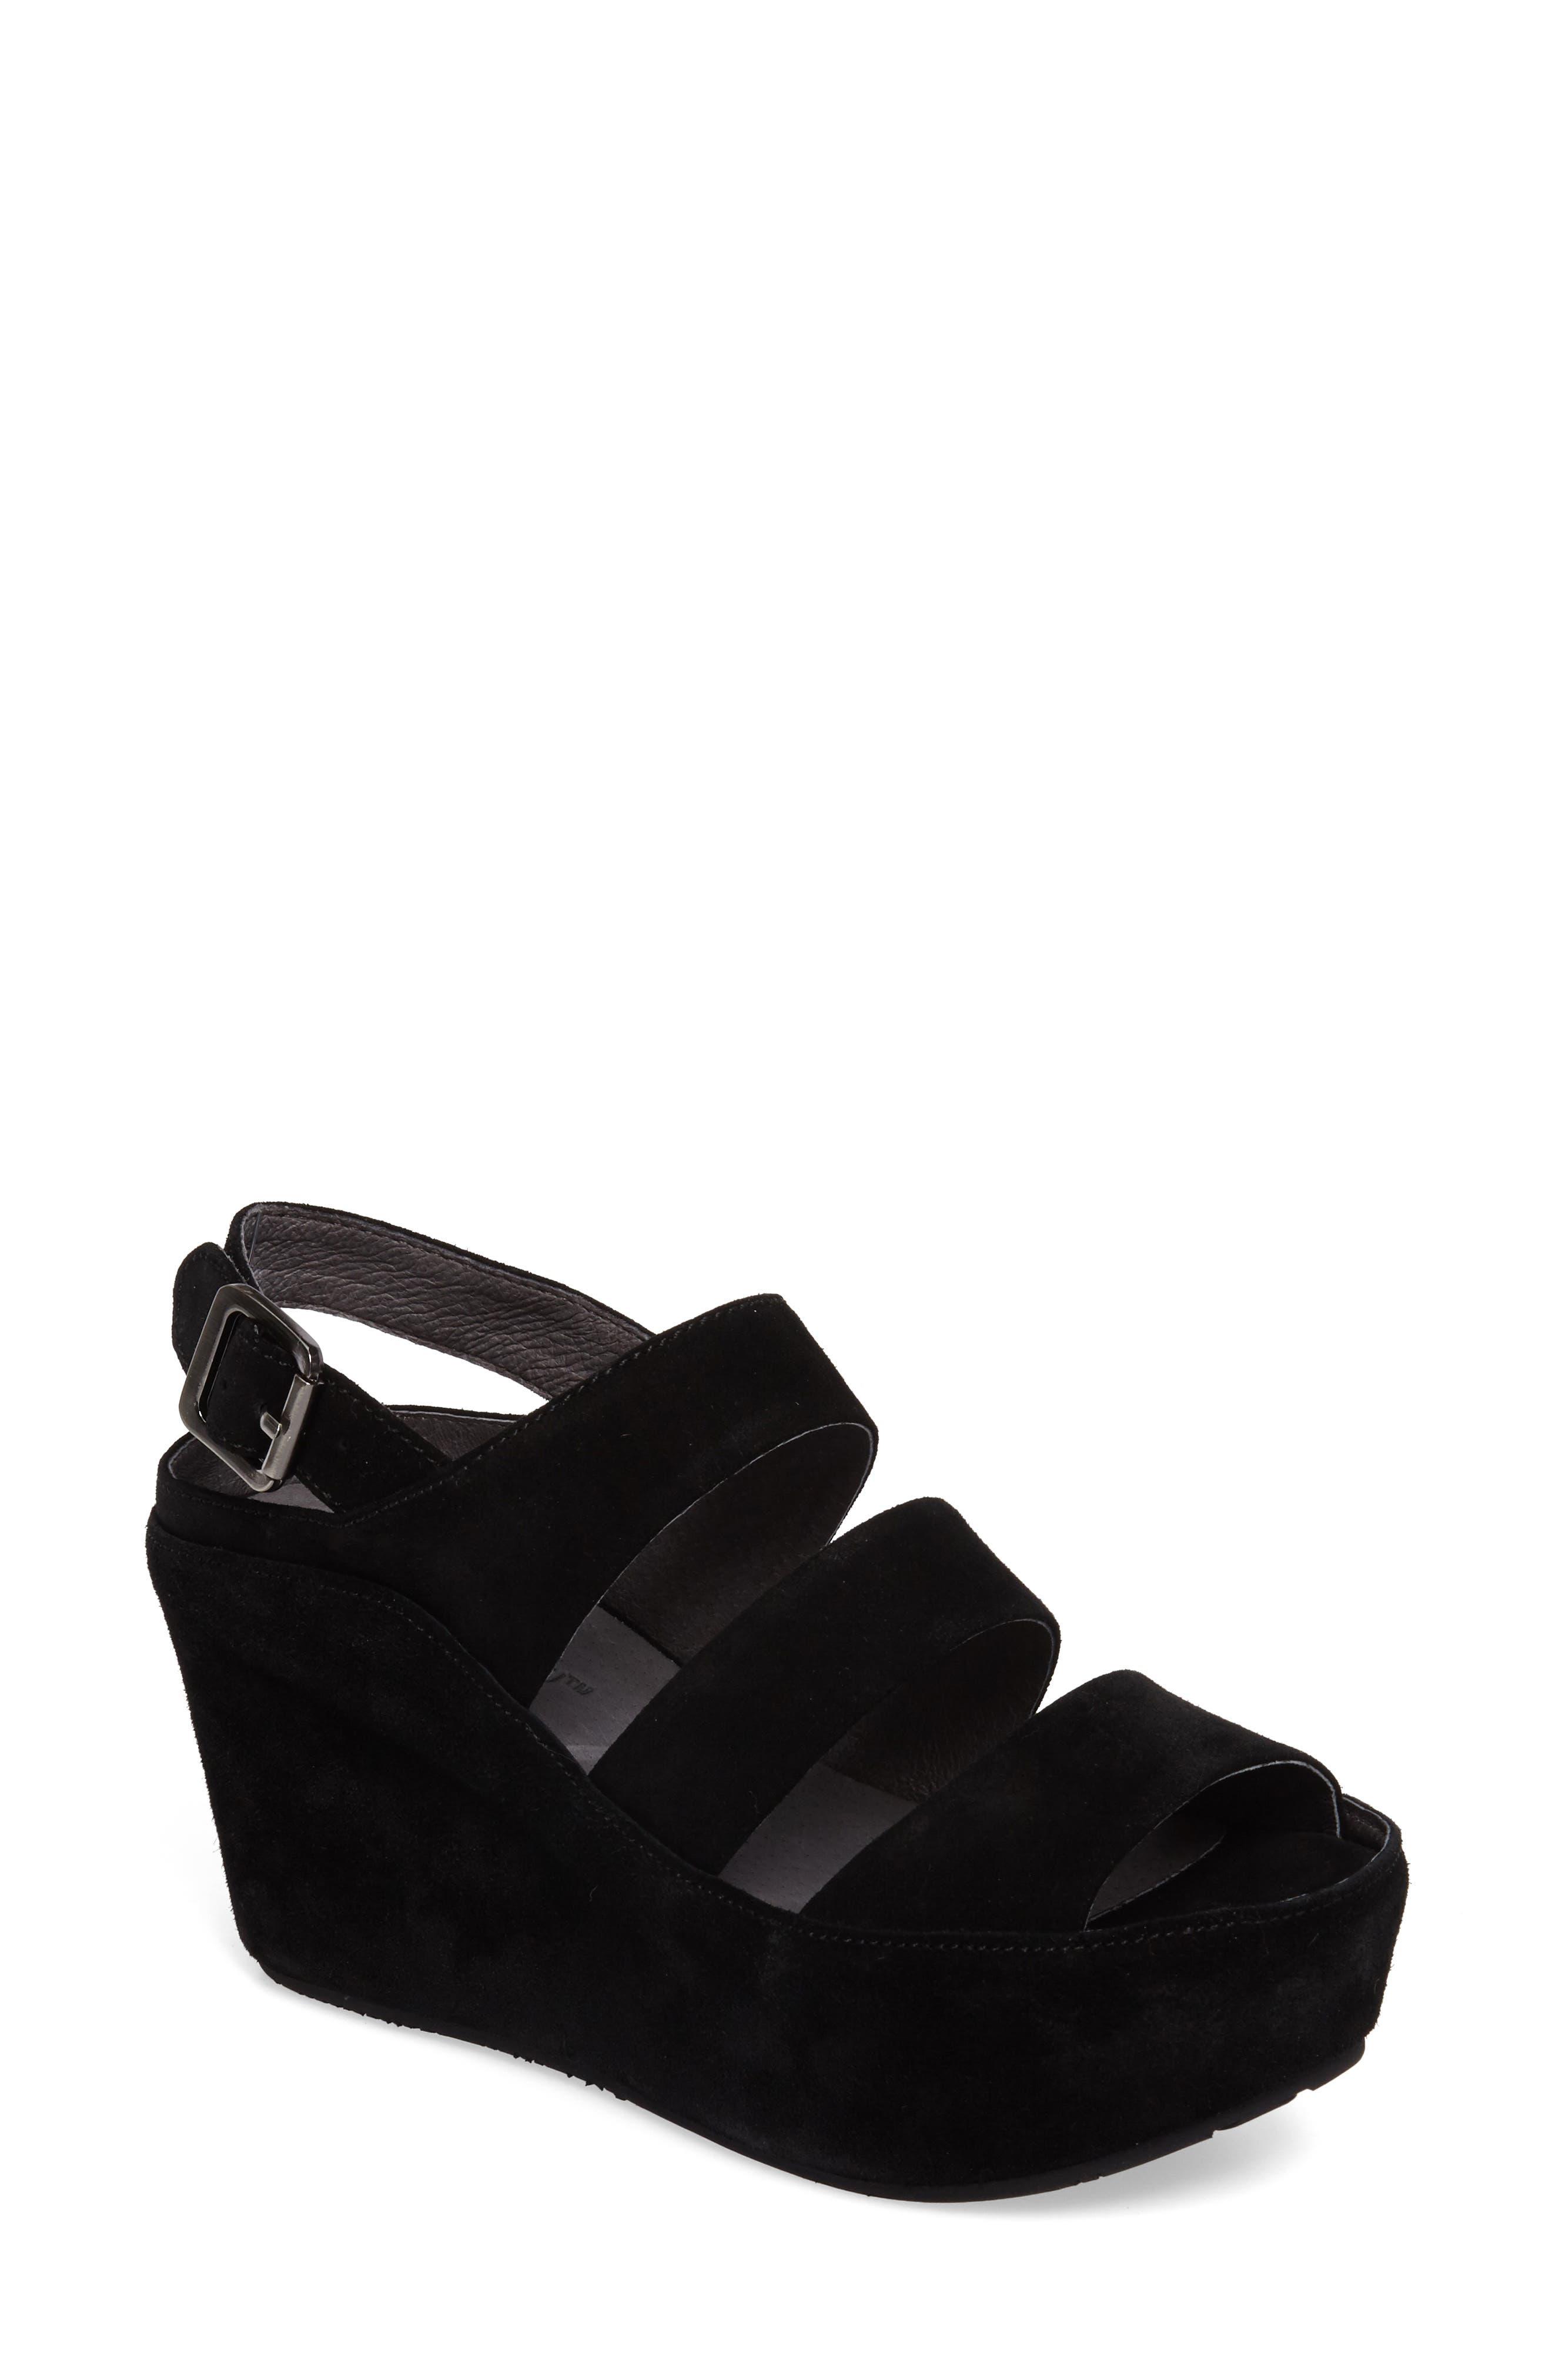 Alternate Image 1 Selected - Chocolat Blu Windsor Platform Wedge Sandal (Women)